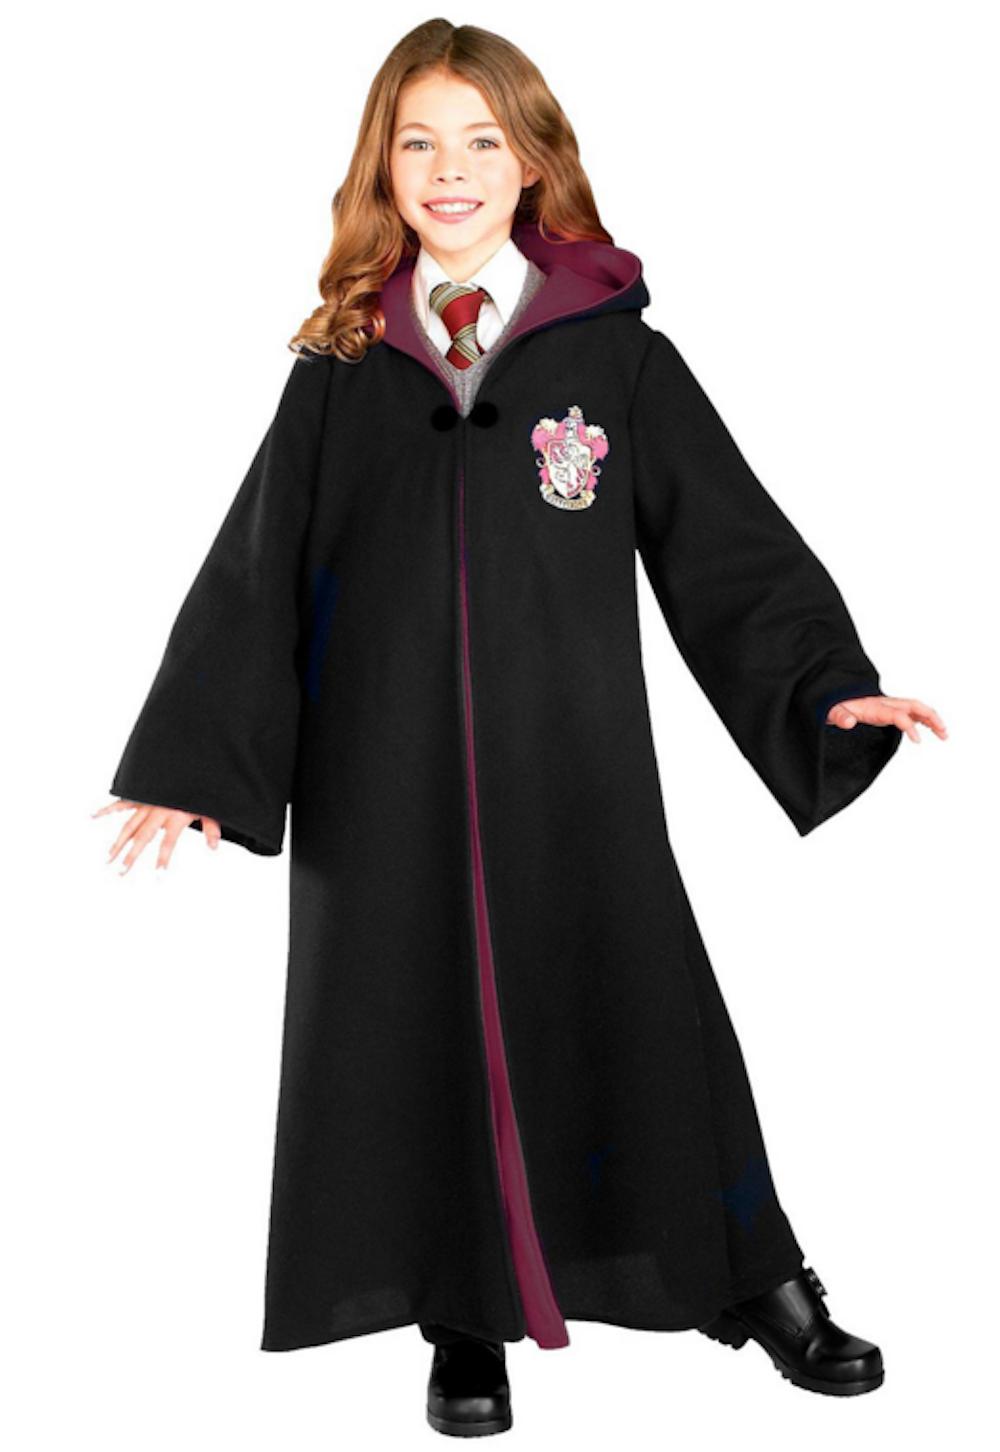 Most popular adult halloween costume 2005